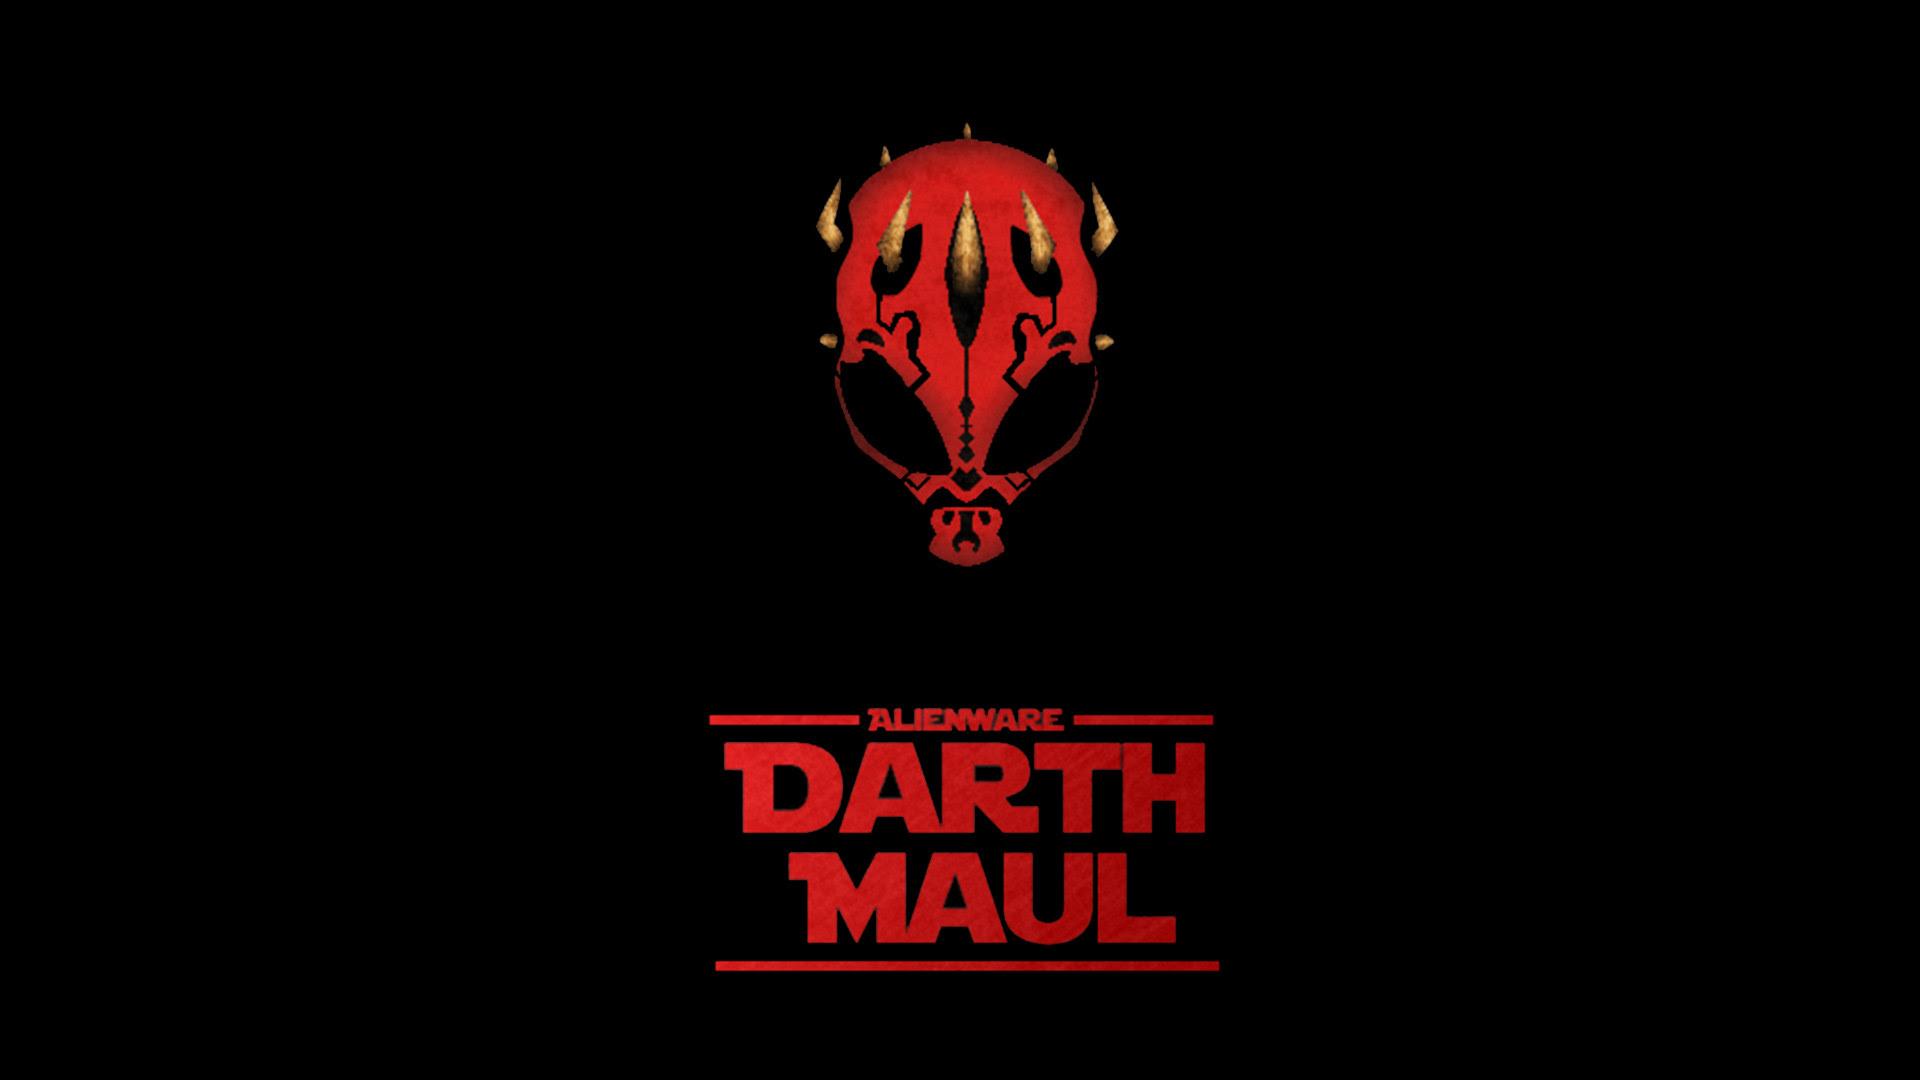 Darth Maul Wallpaper 1080p 71 Images